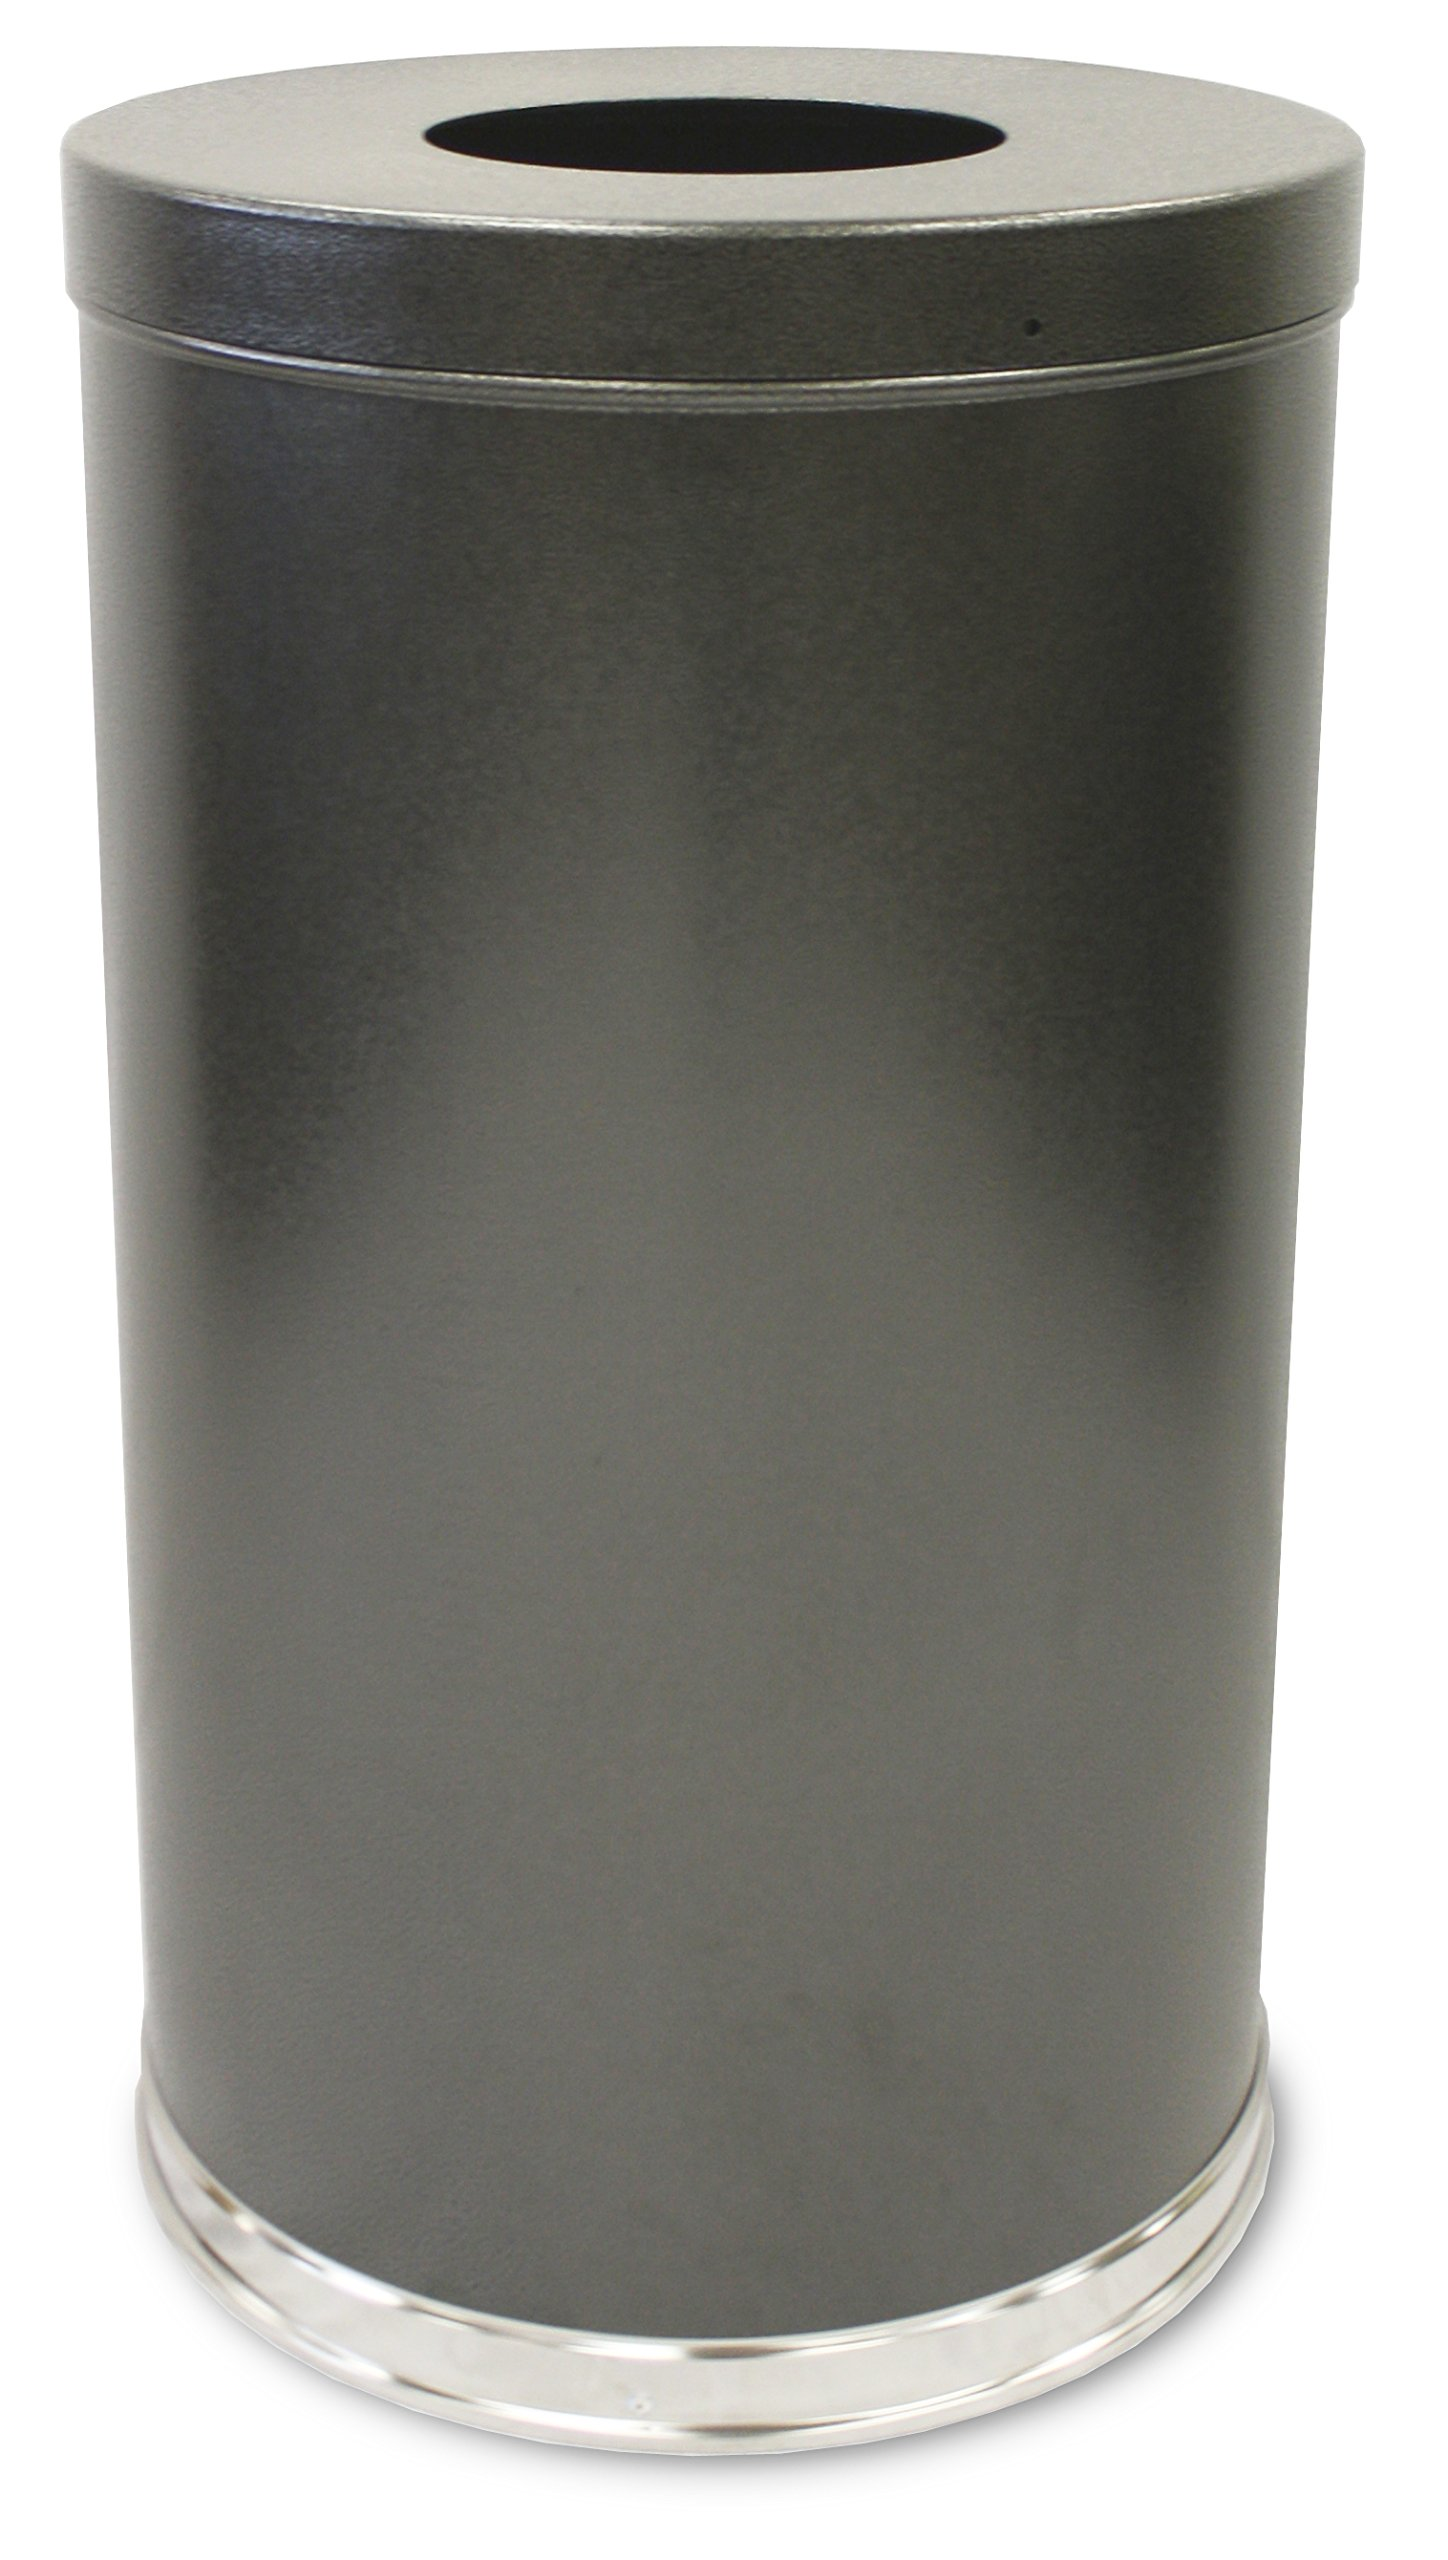 Witt Industries 35FTSVN Steel 35-Gallon Open Top Waste Receptacle with Plastic Liner, Round, 18'' Diameter x 33'' Height, Silver